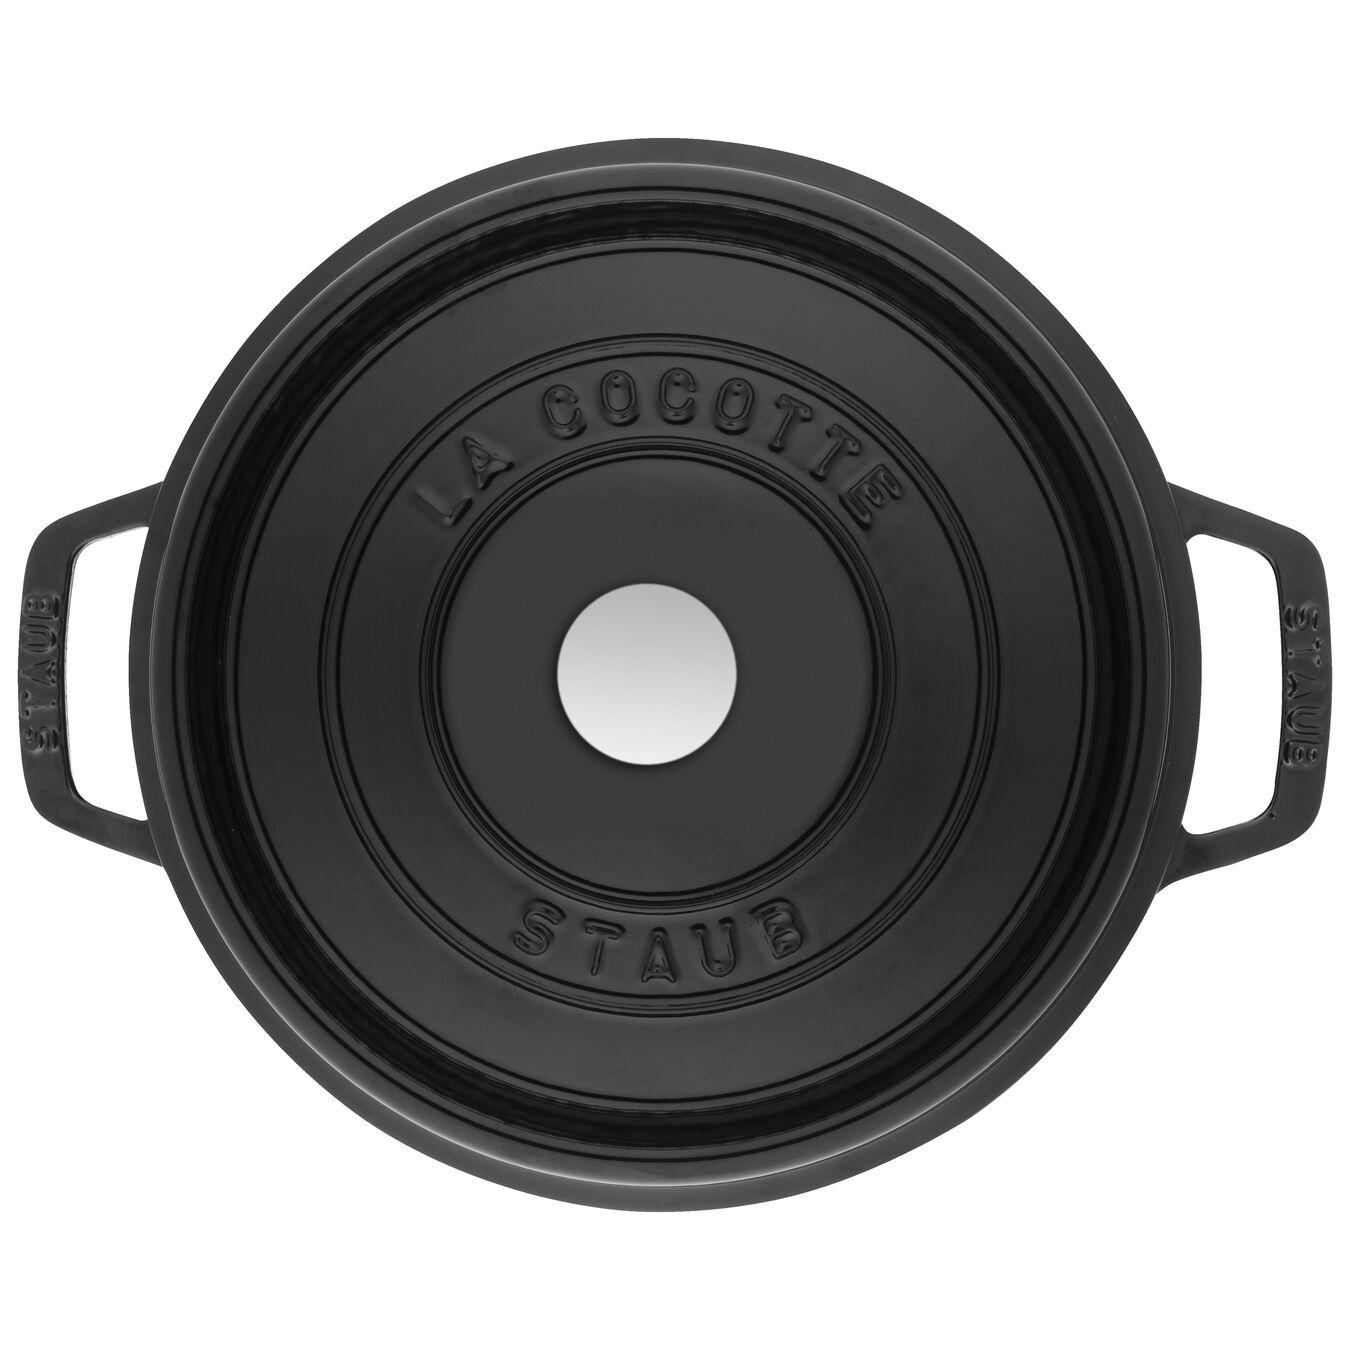 4,75 l Cast iron round Faitout, Shiny-Black,,large 5